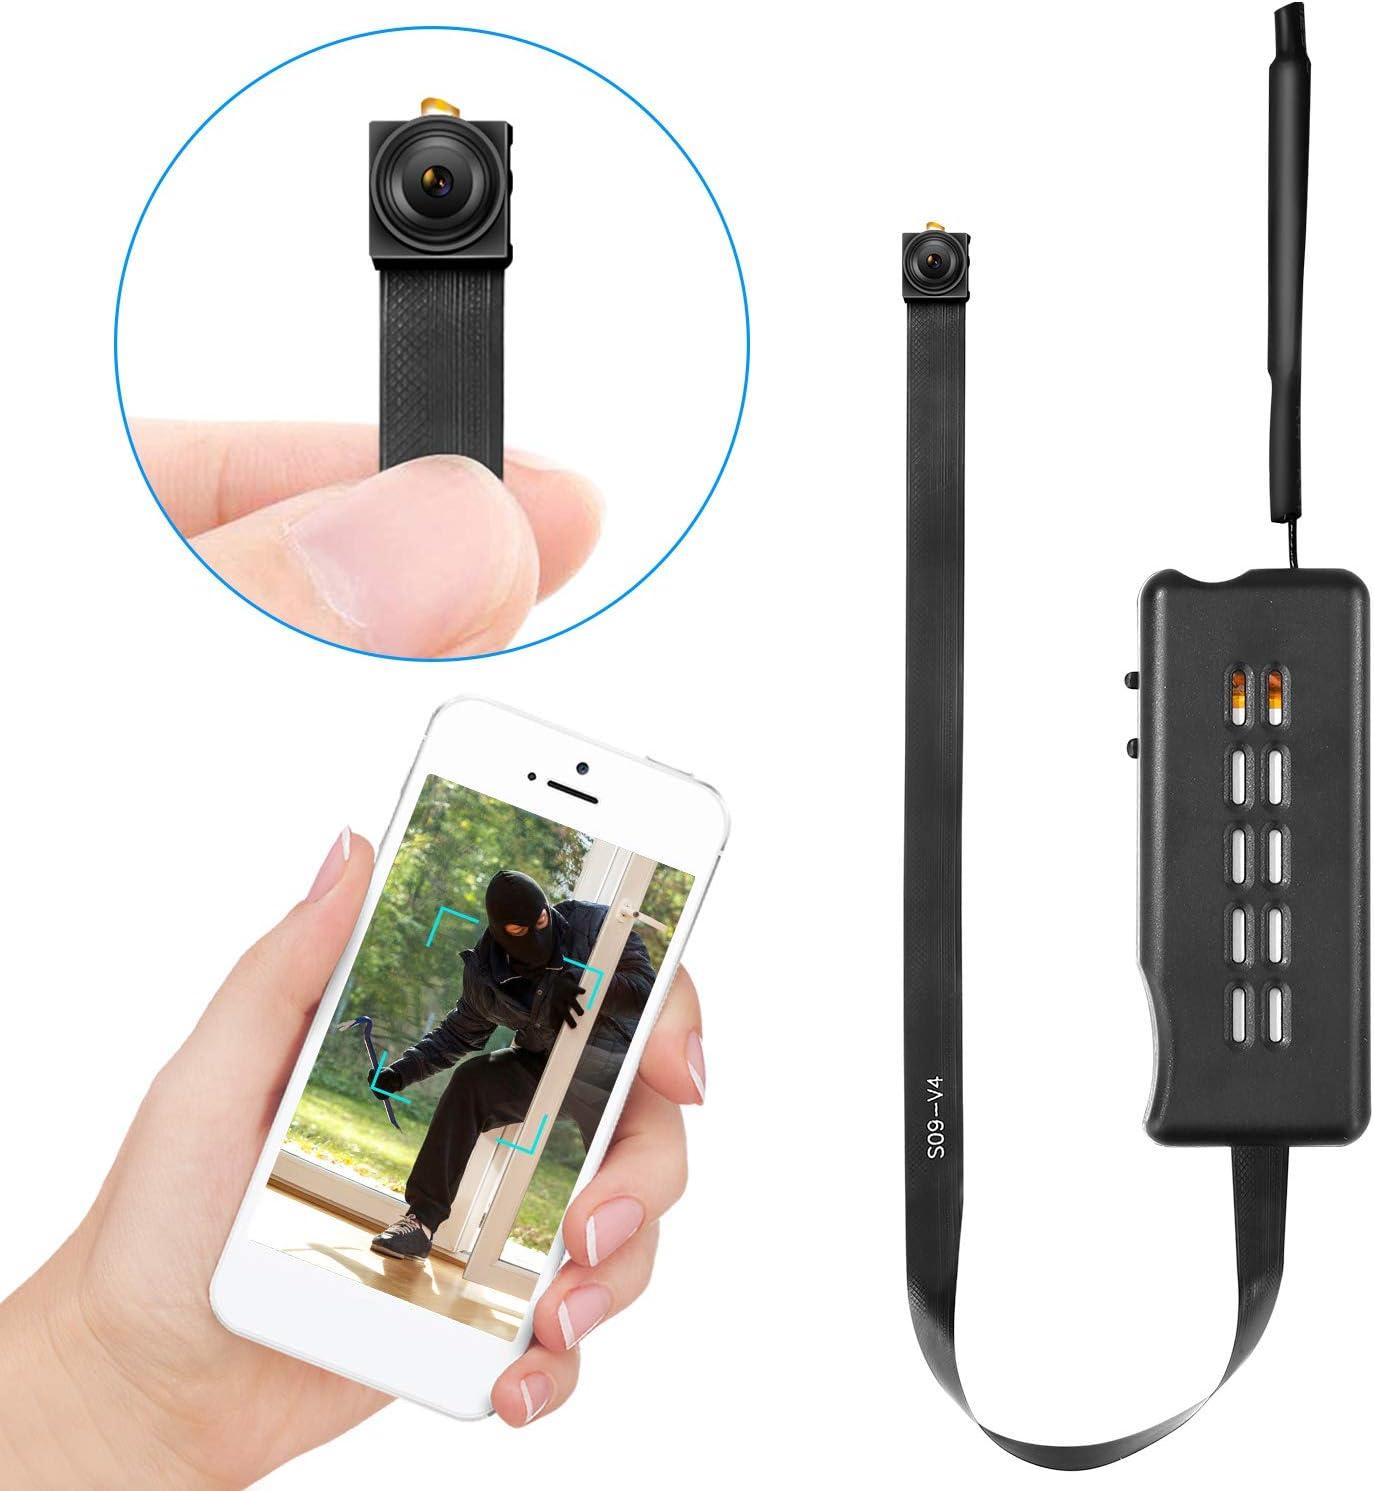 Facamword Spy Camera Wireless Hidden Cameras DIY Module Nanny Cam WiFi Covert Cam for Home Security Motion Detection Alarm & Record Live Streaming via Android iOS APP